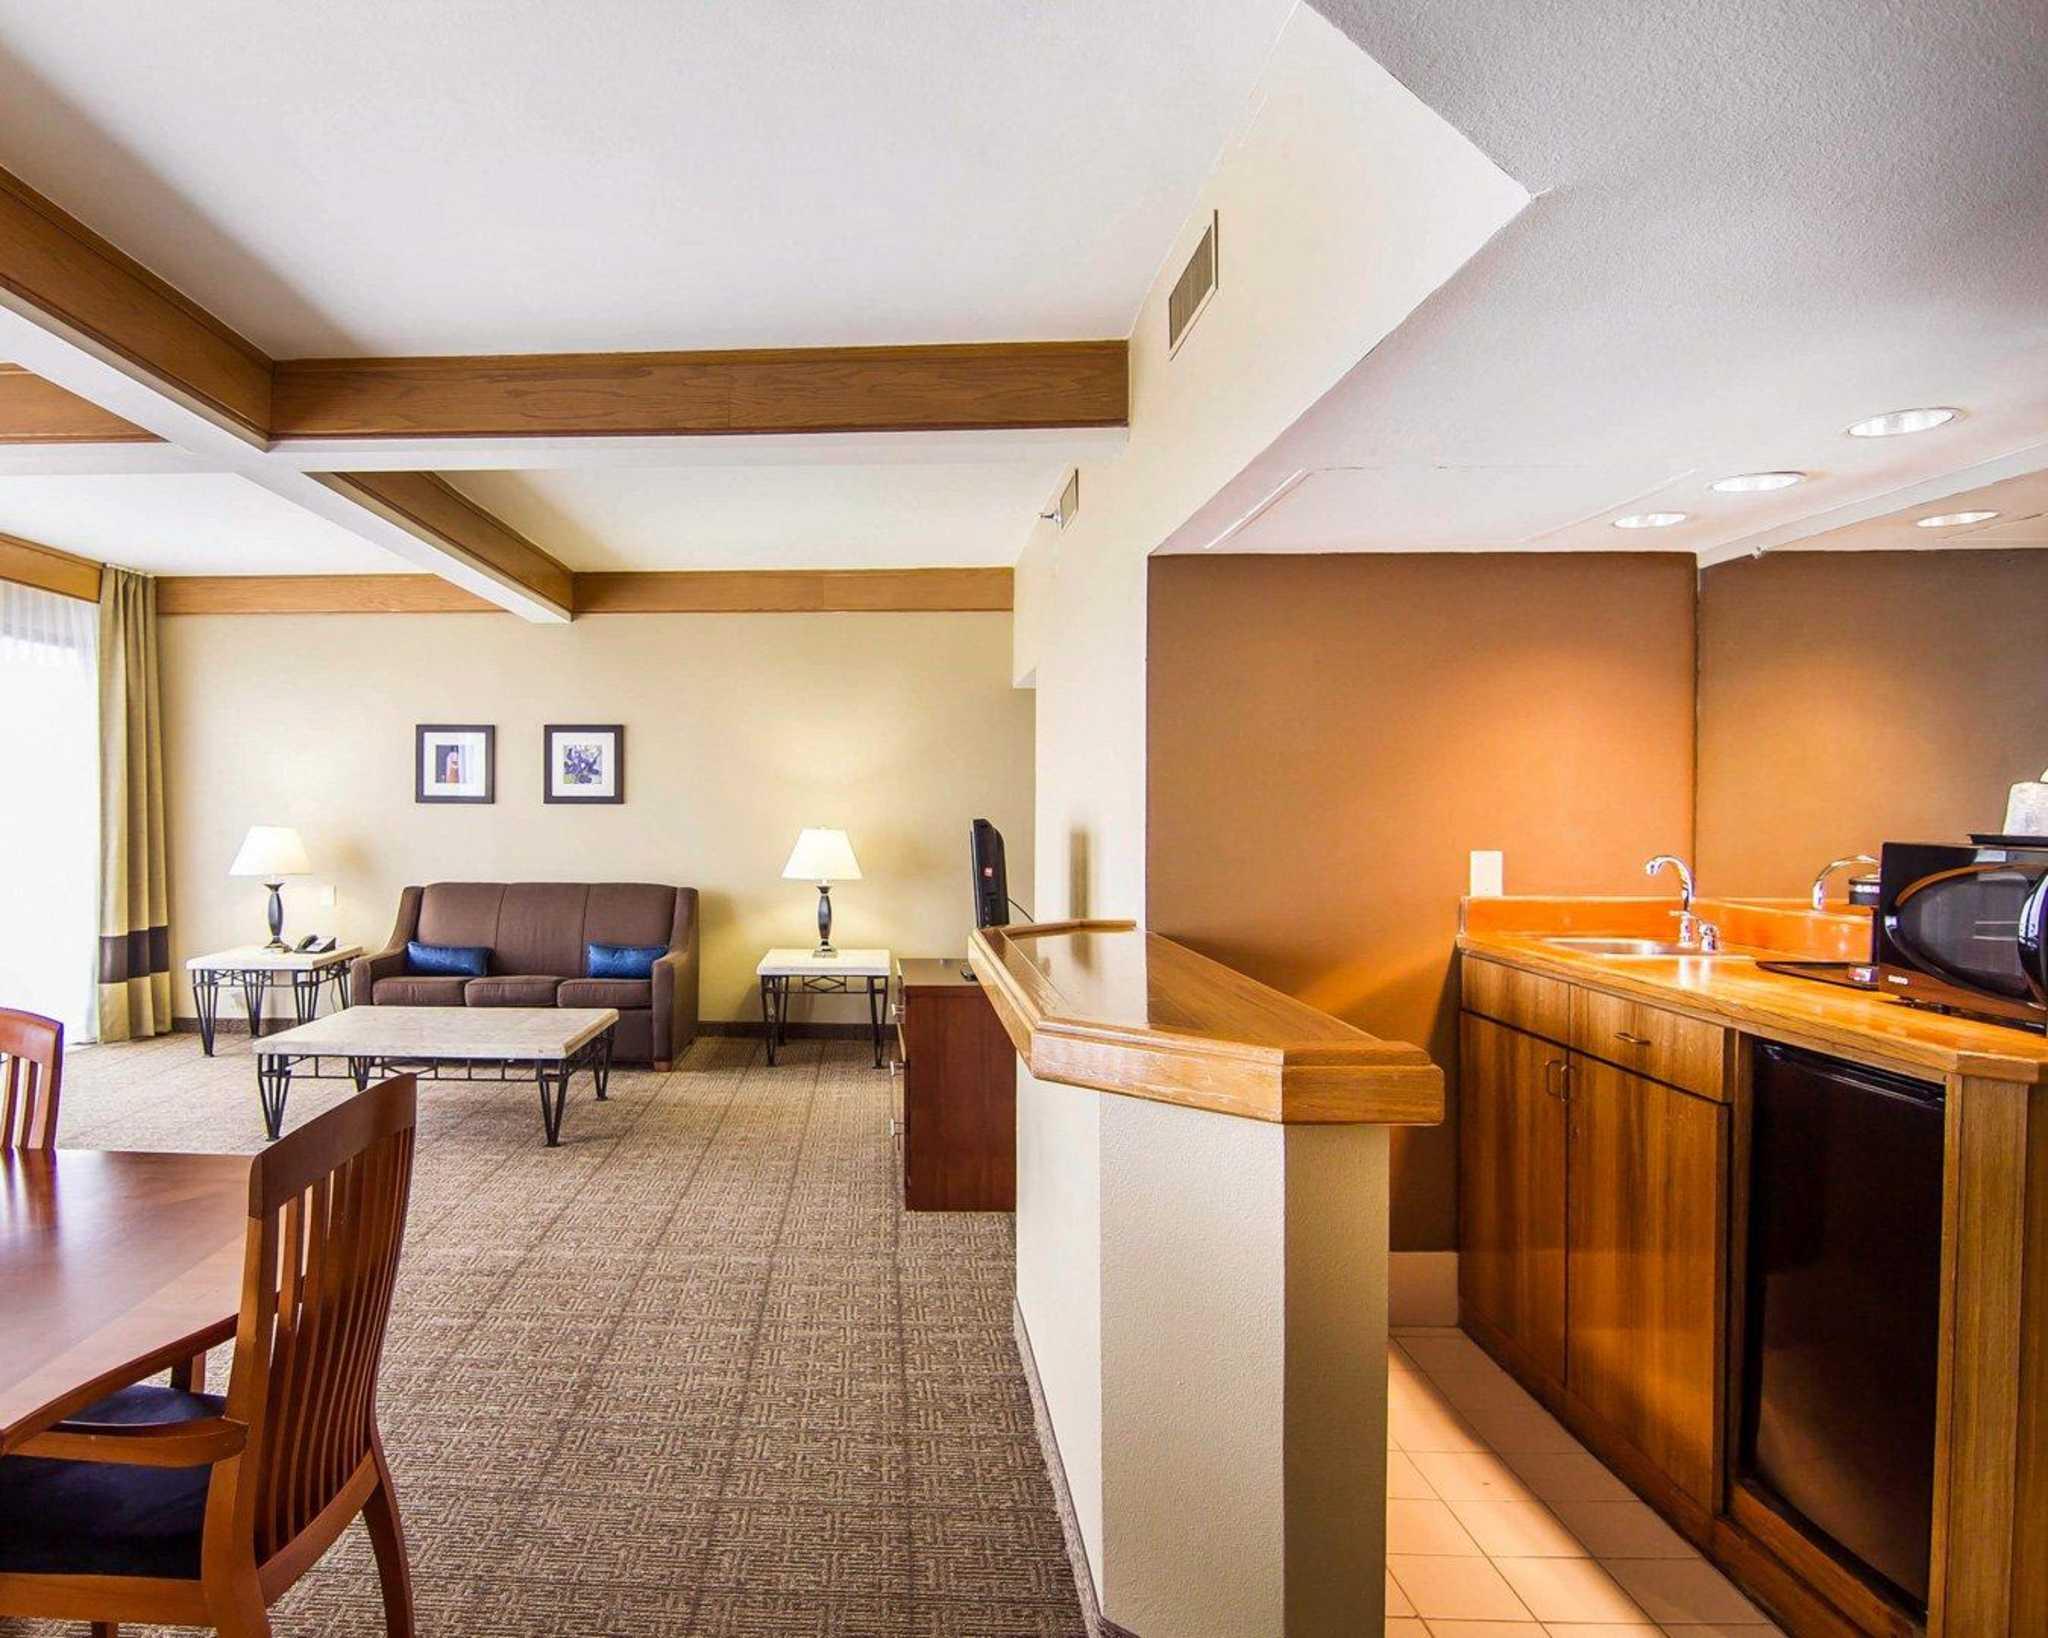 Comfort Inn & Suites Plano East image 48